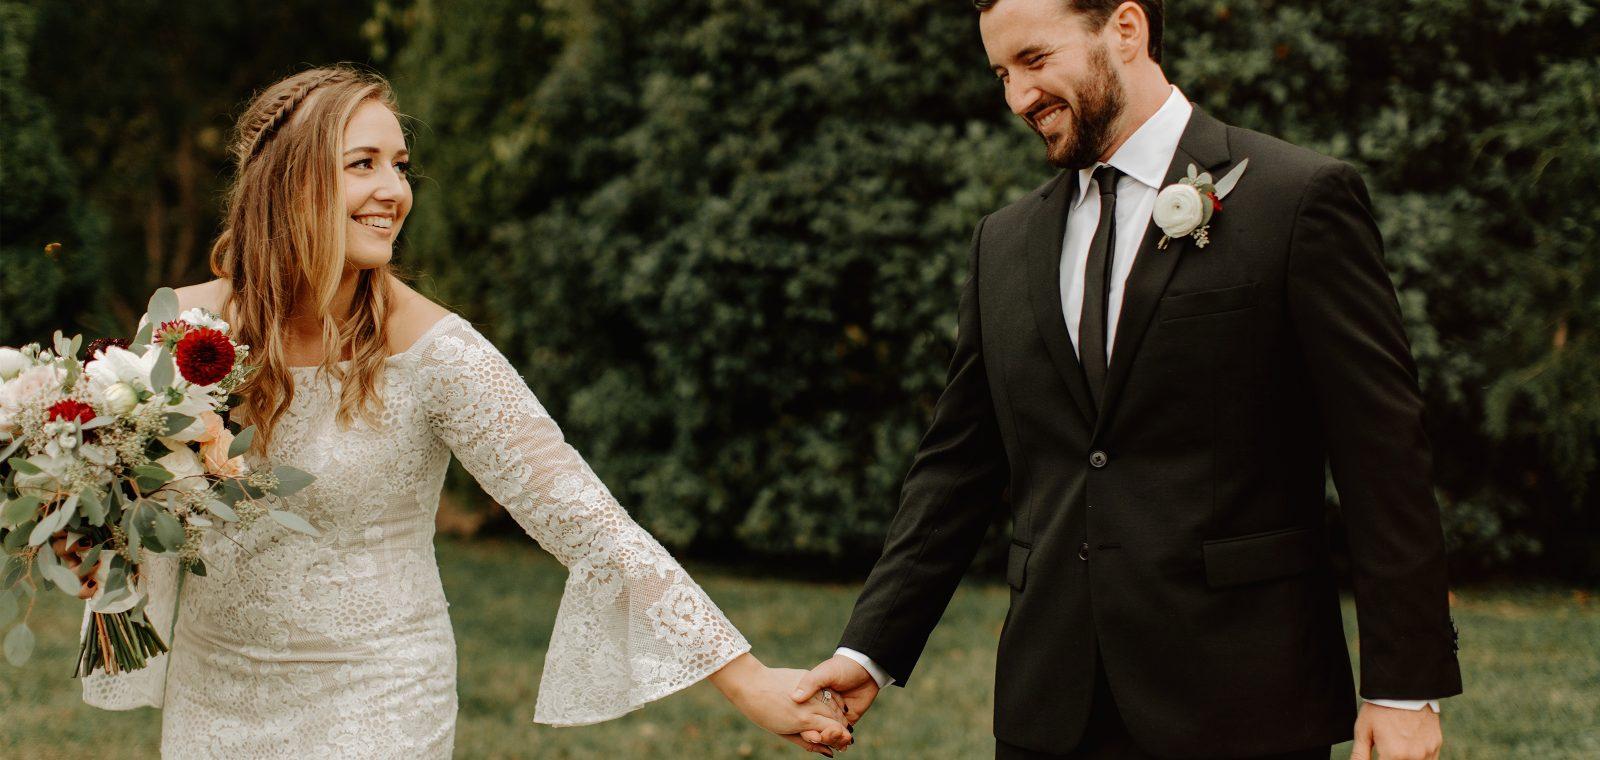 Fall Cedarwood Wedding – Nashville, TN – Kara & PJ